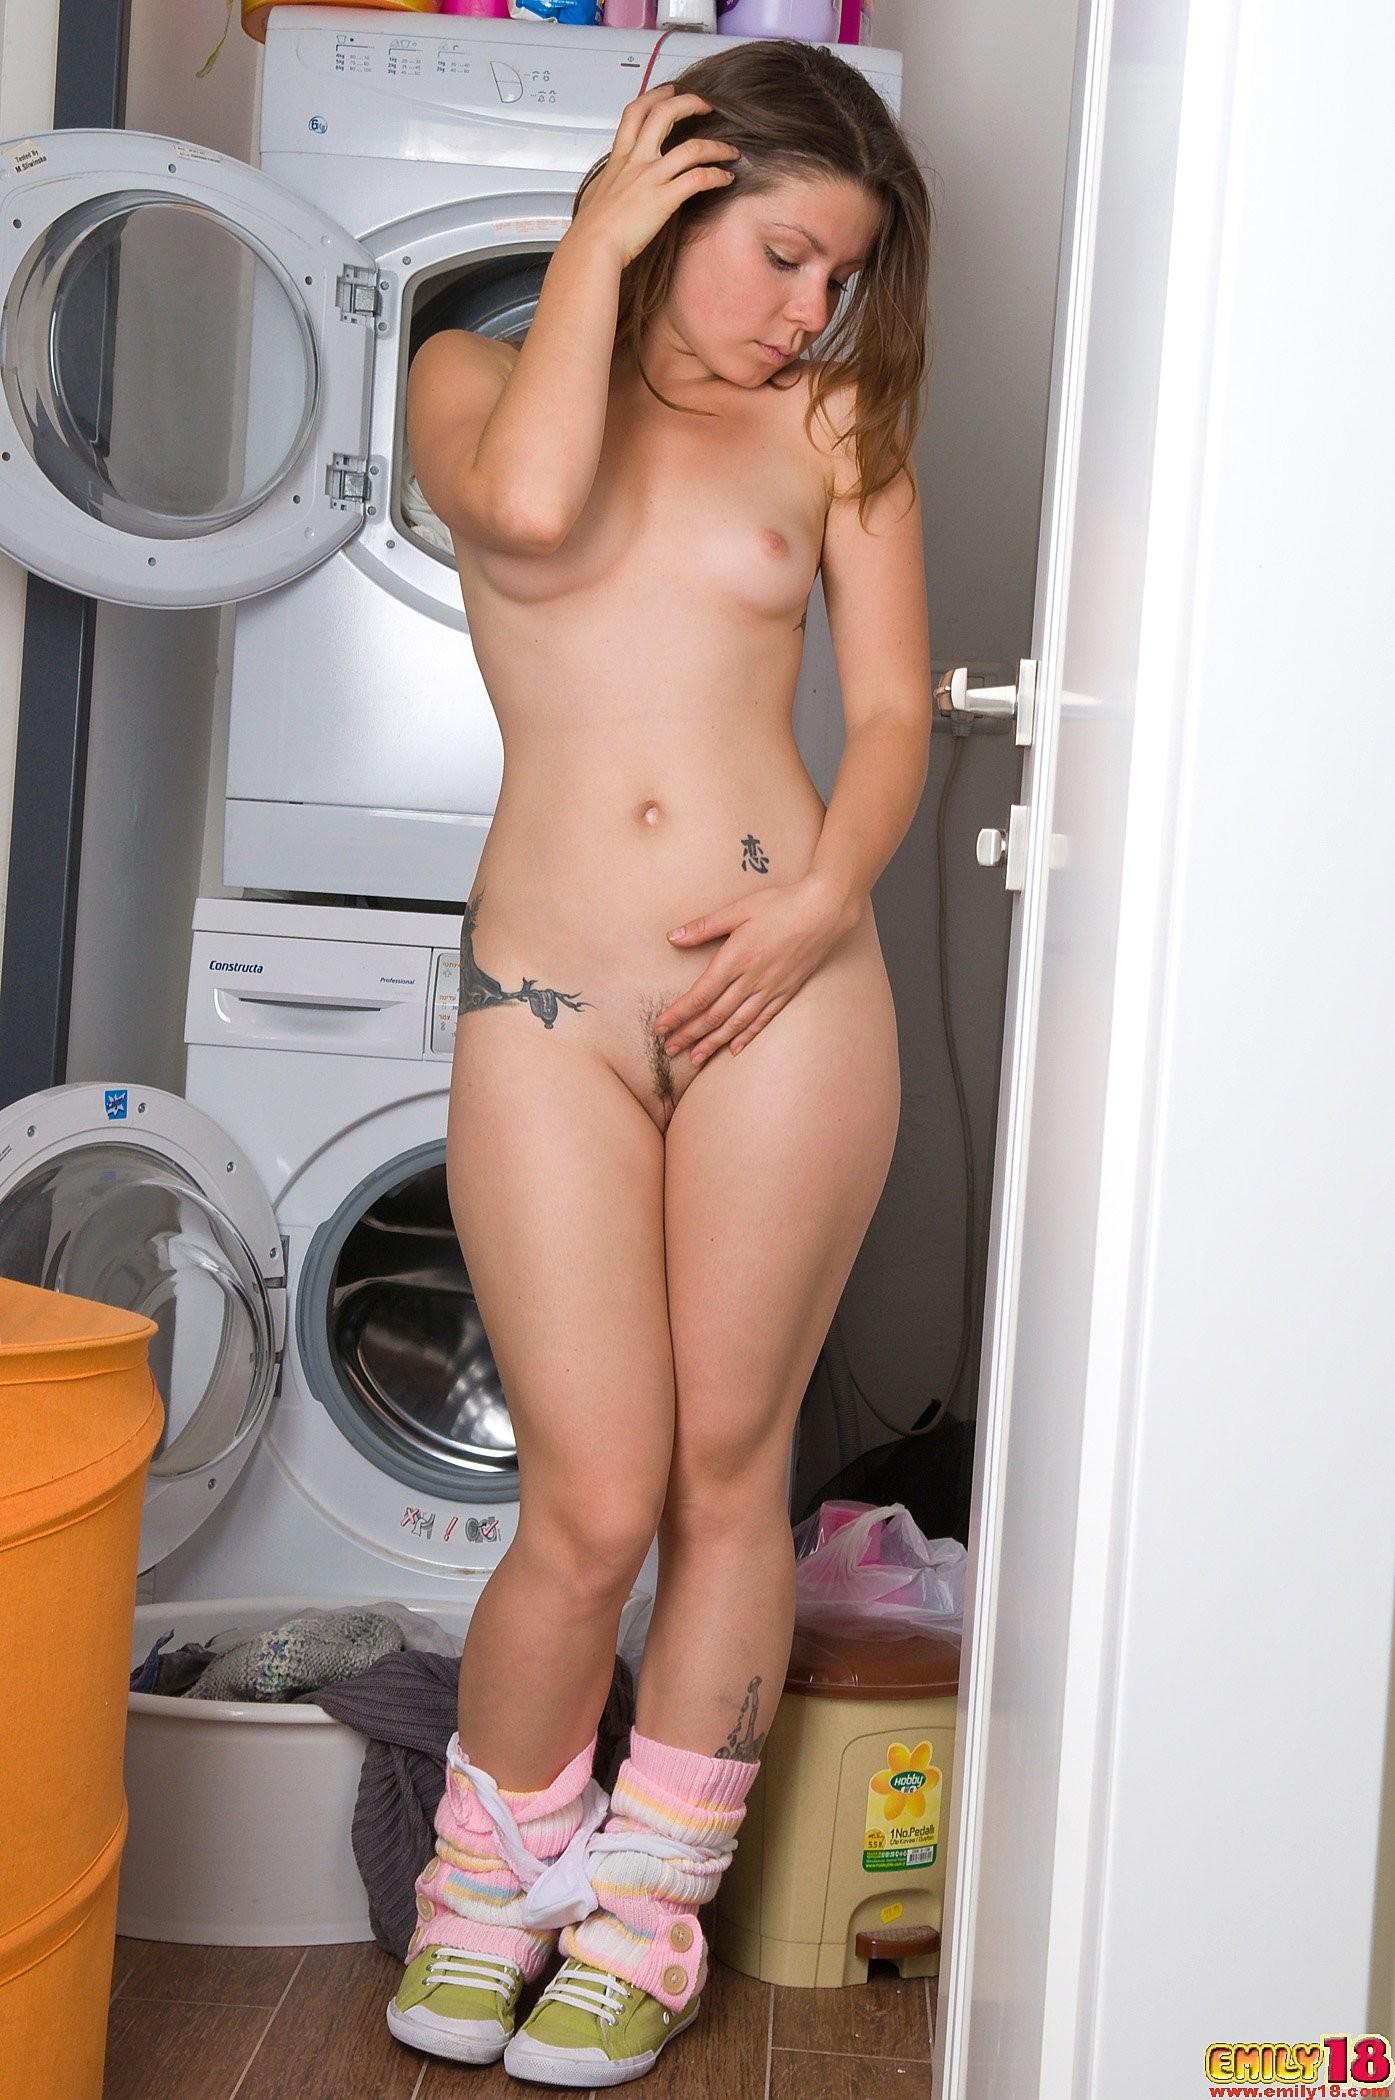 laundry-girls-nude-washing-machine-photo-mix-38